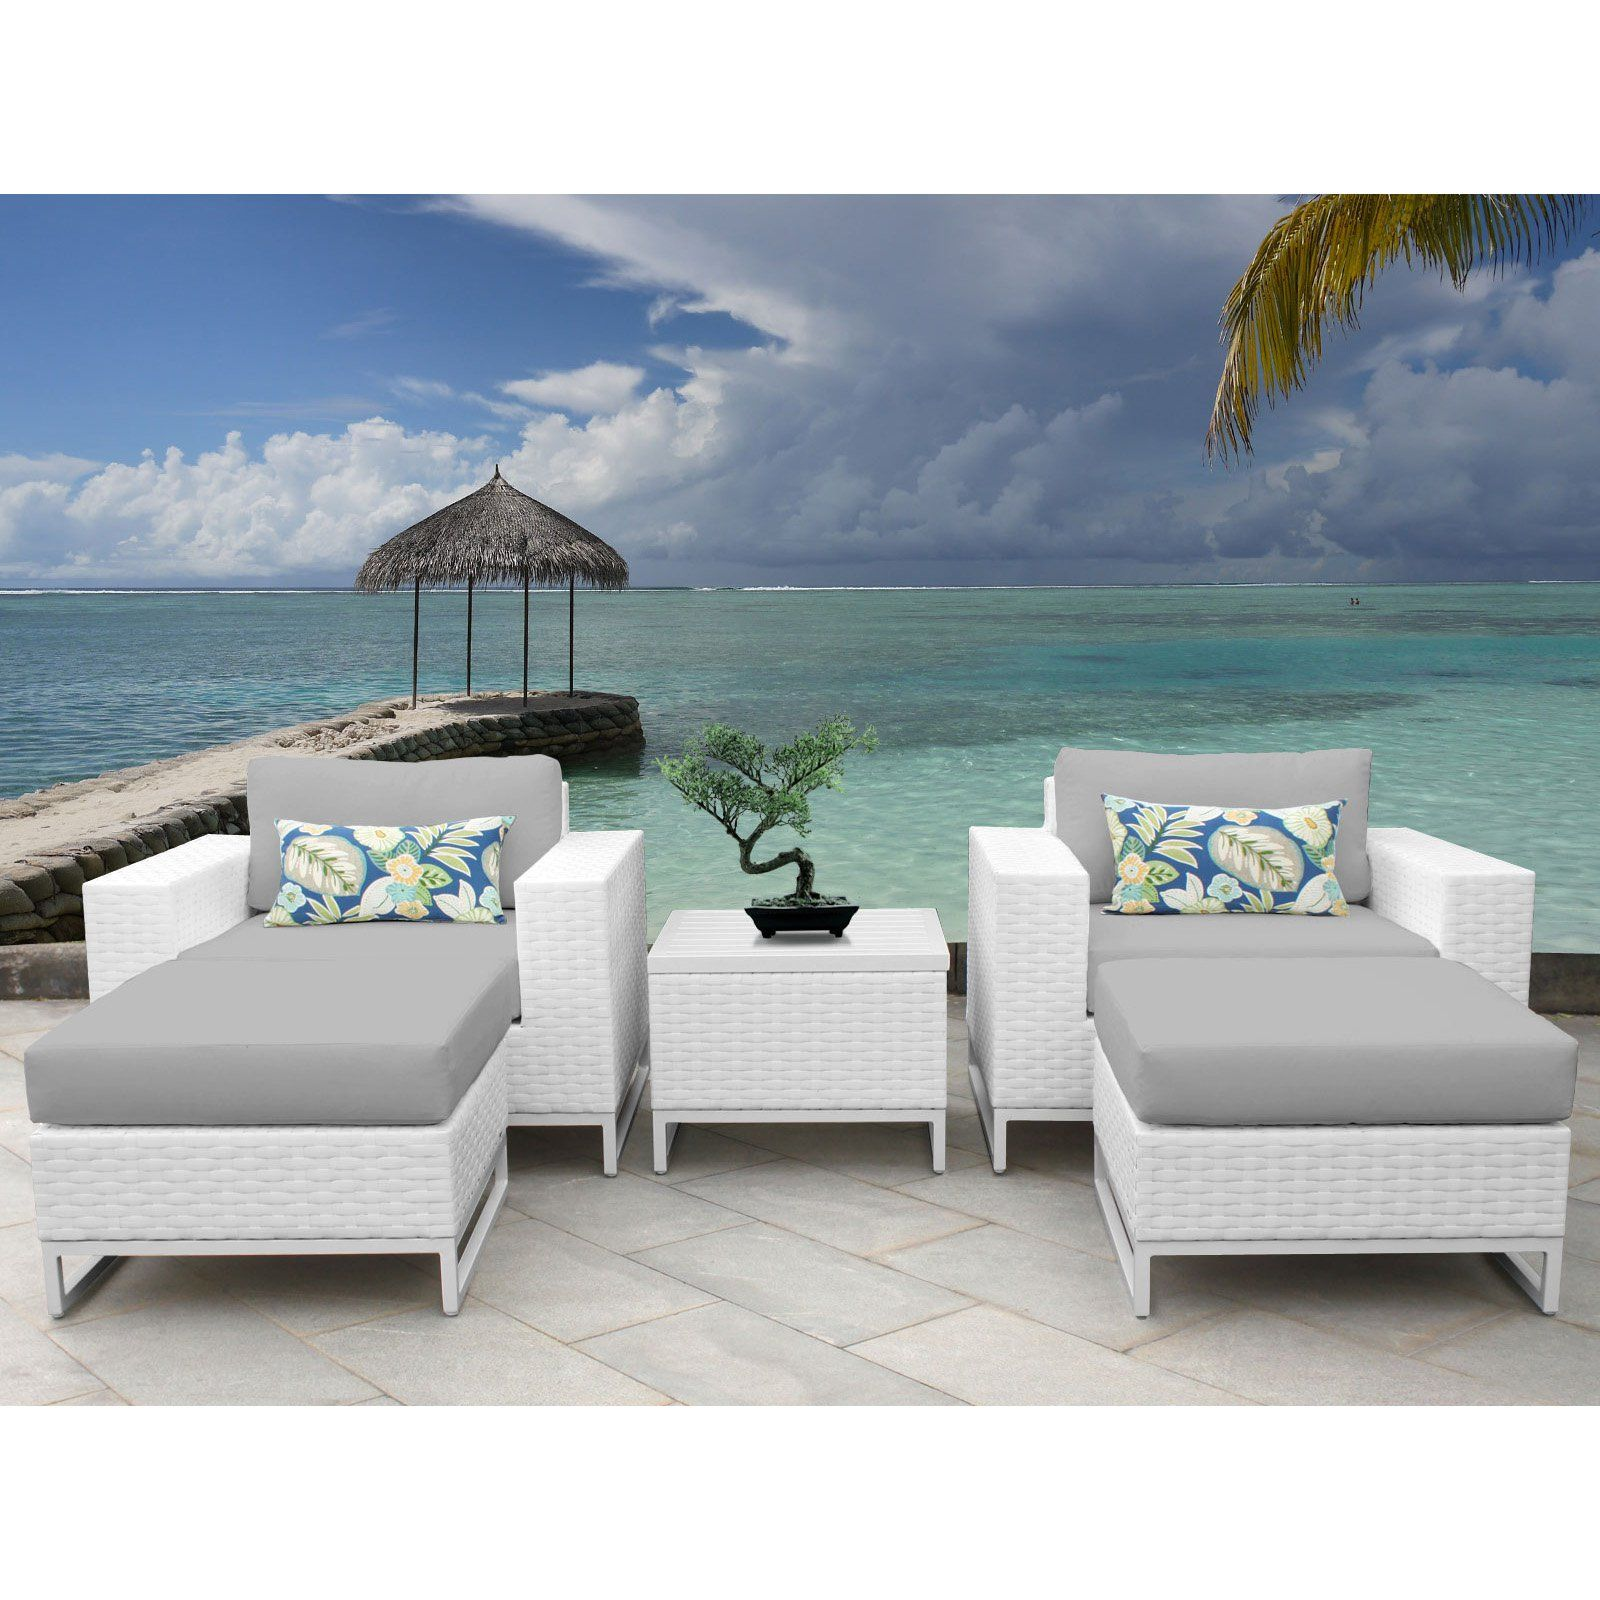 Outdoor Tk Classics Miami Wicker 5 Piece Patio Conversation Set